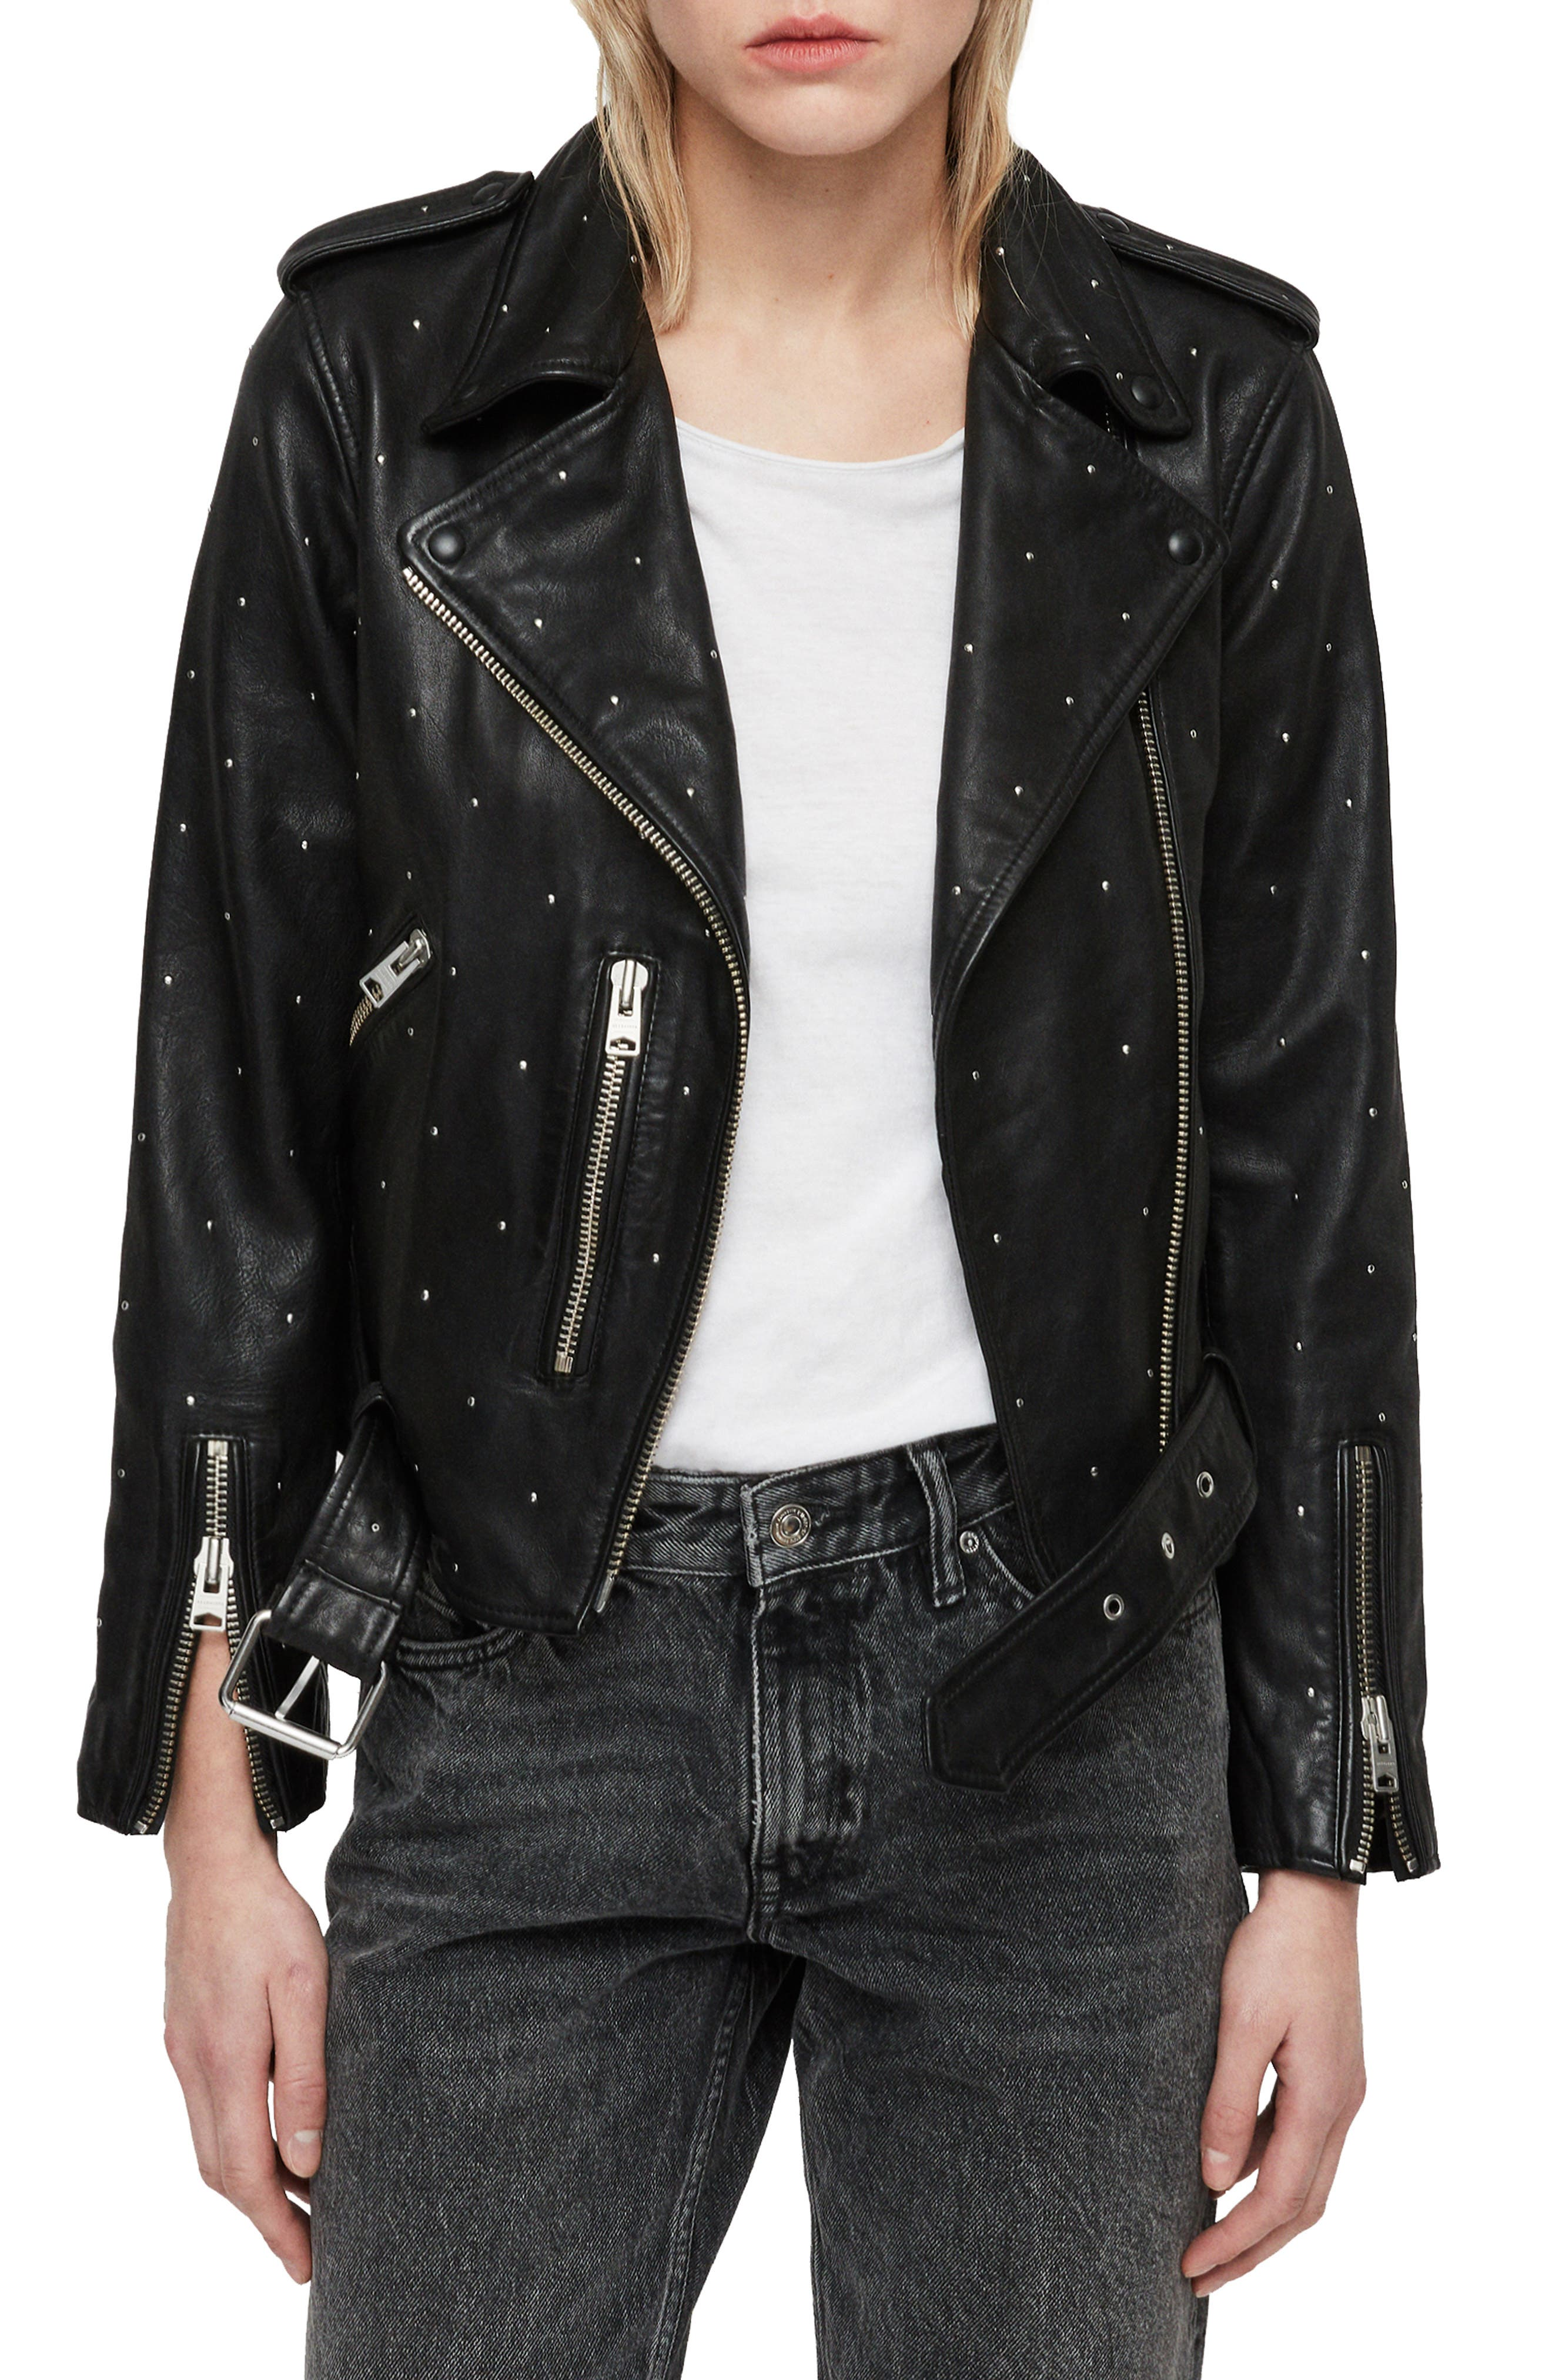 Balfern Studded Leather Biker Jacket,                             Main thumbnail 1, color,                             001